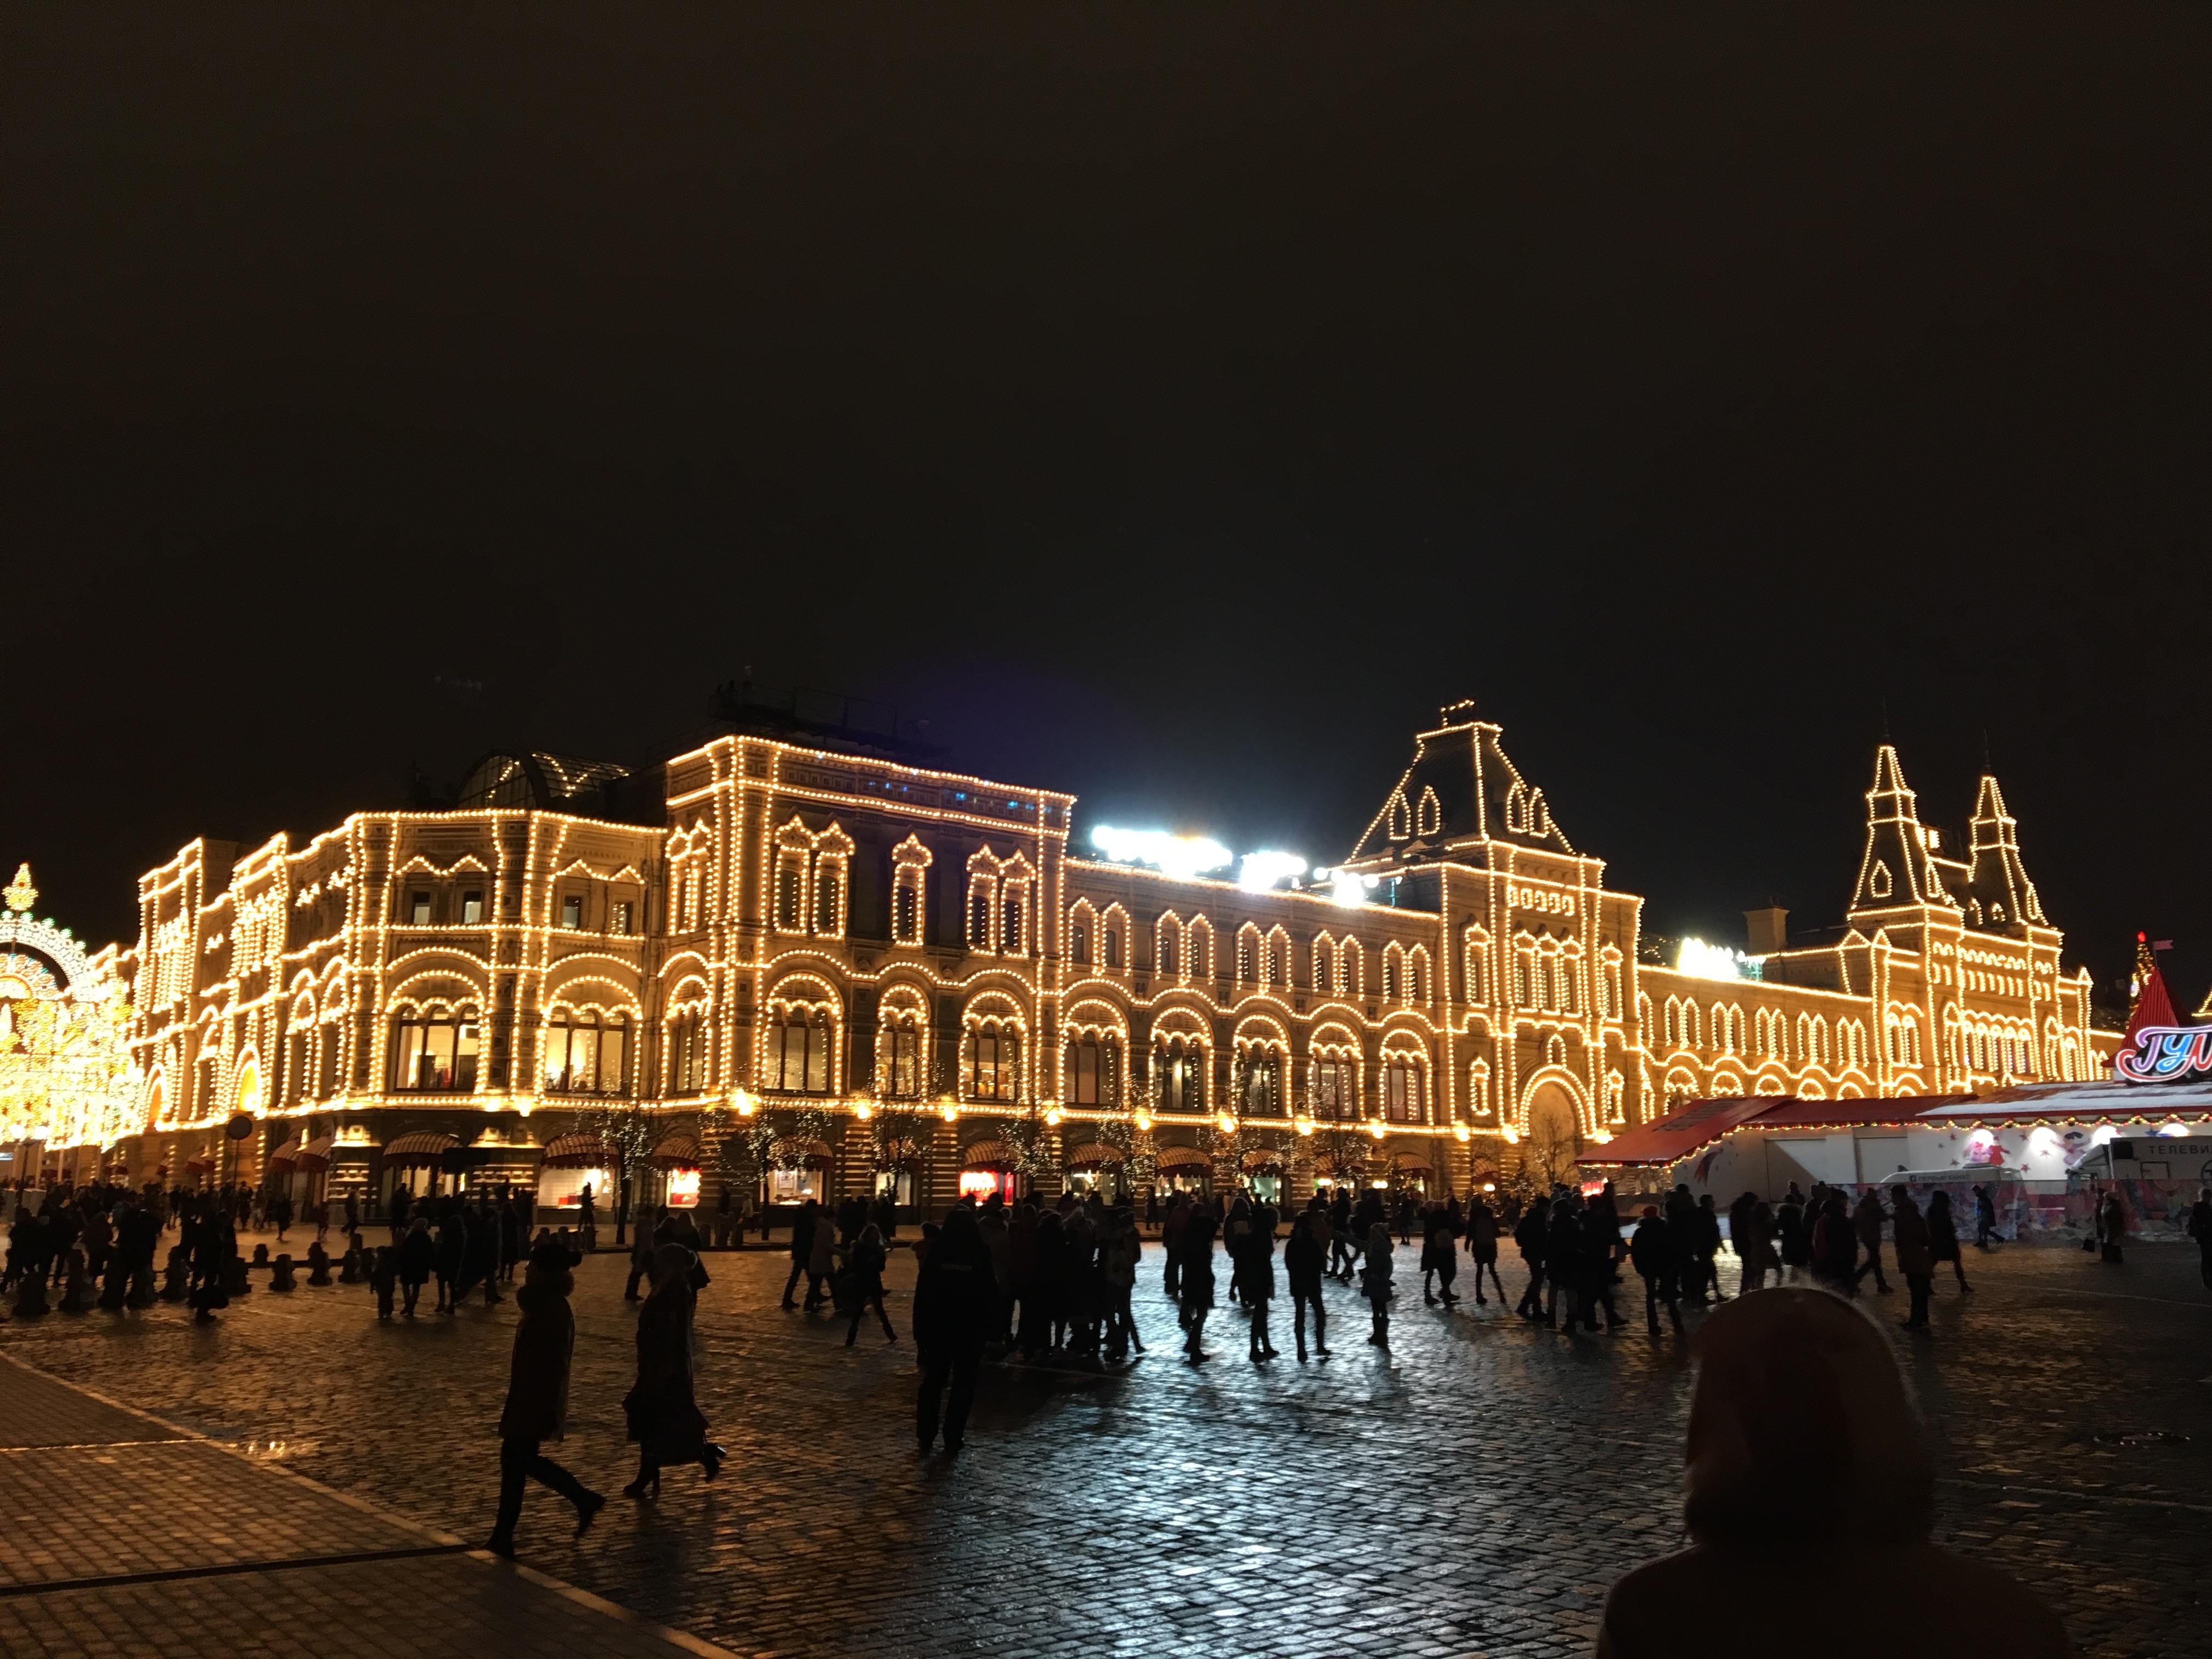 Moskovan jouluvalot Gum